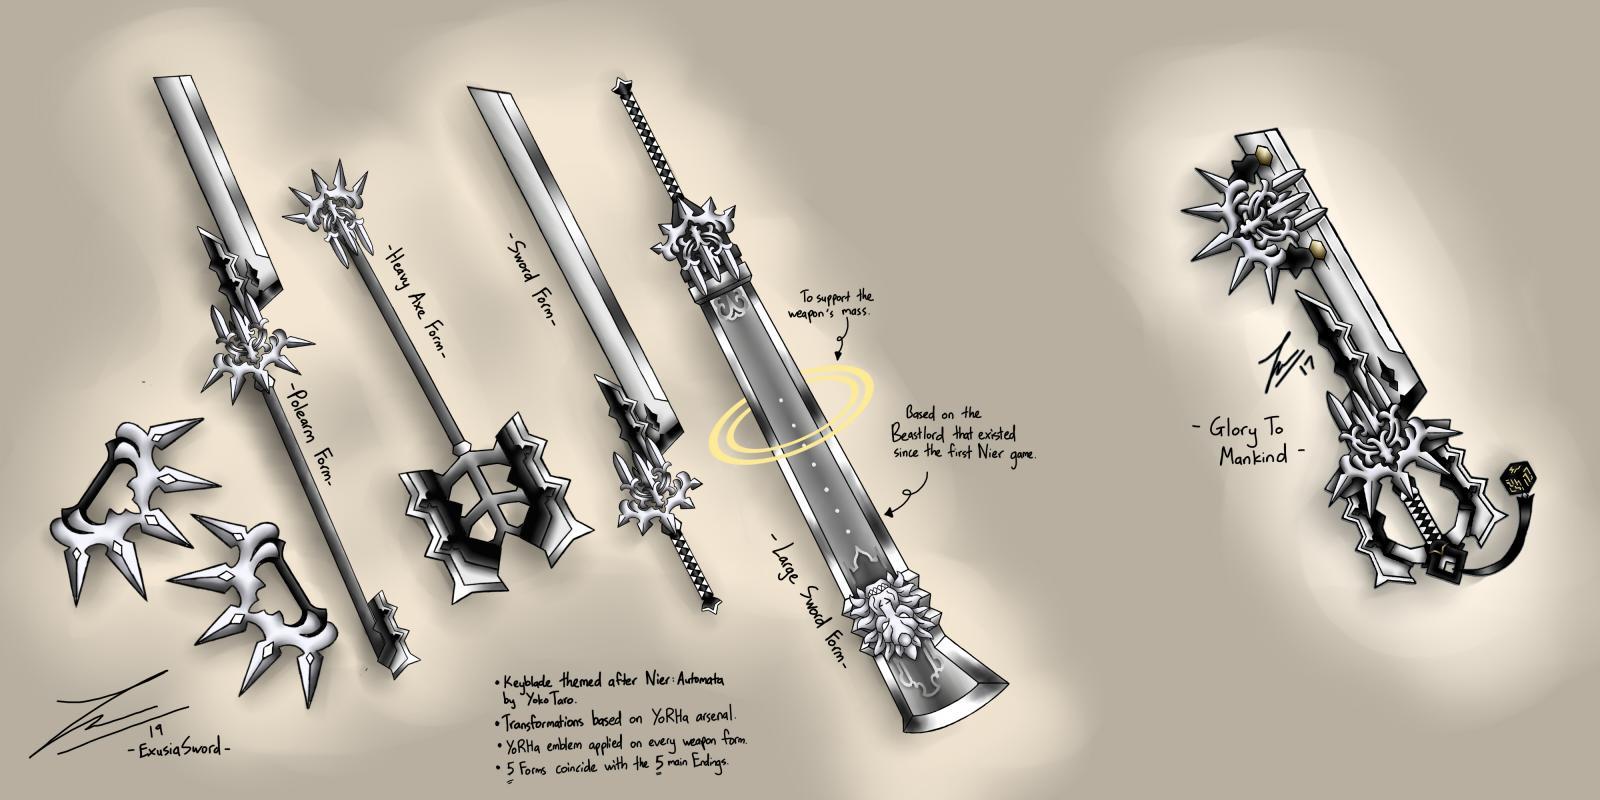 Glory to Mankind Keyblade Transformation